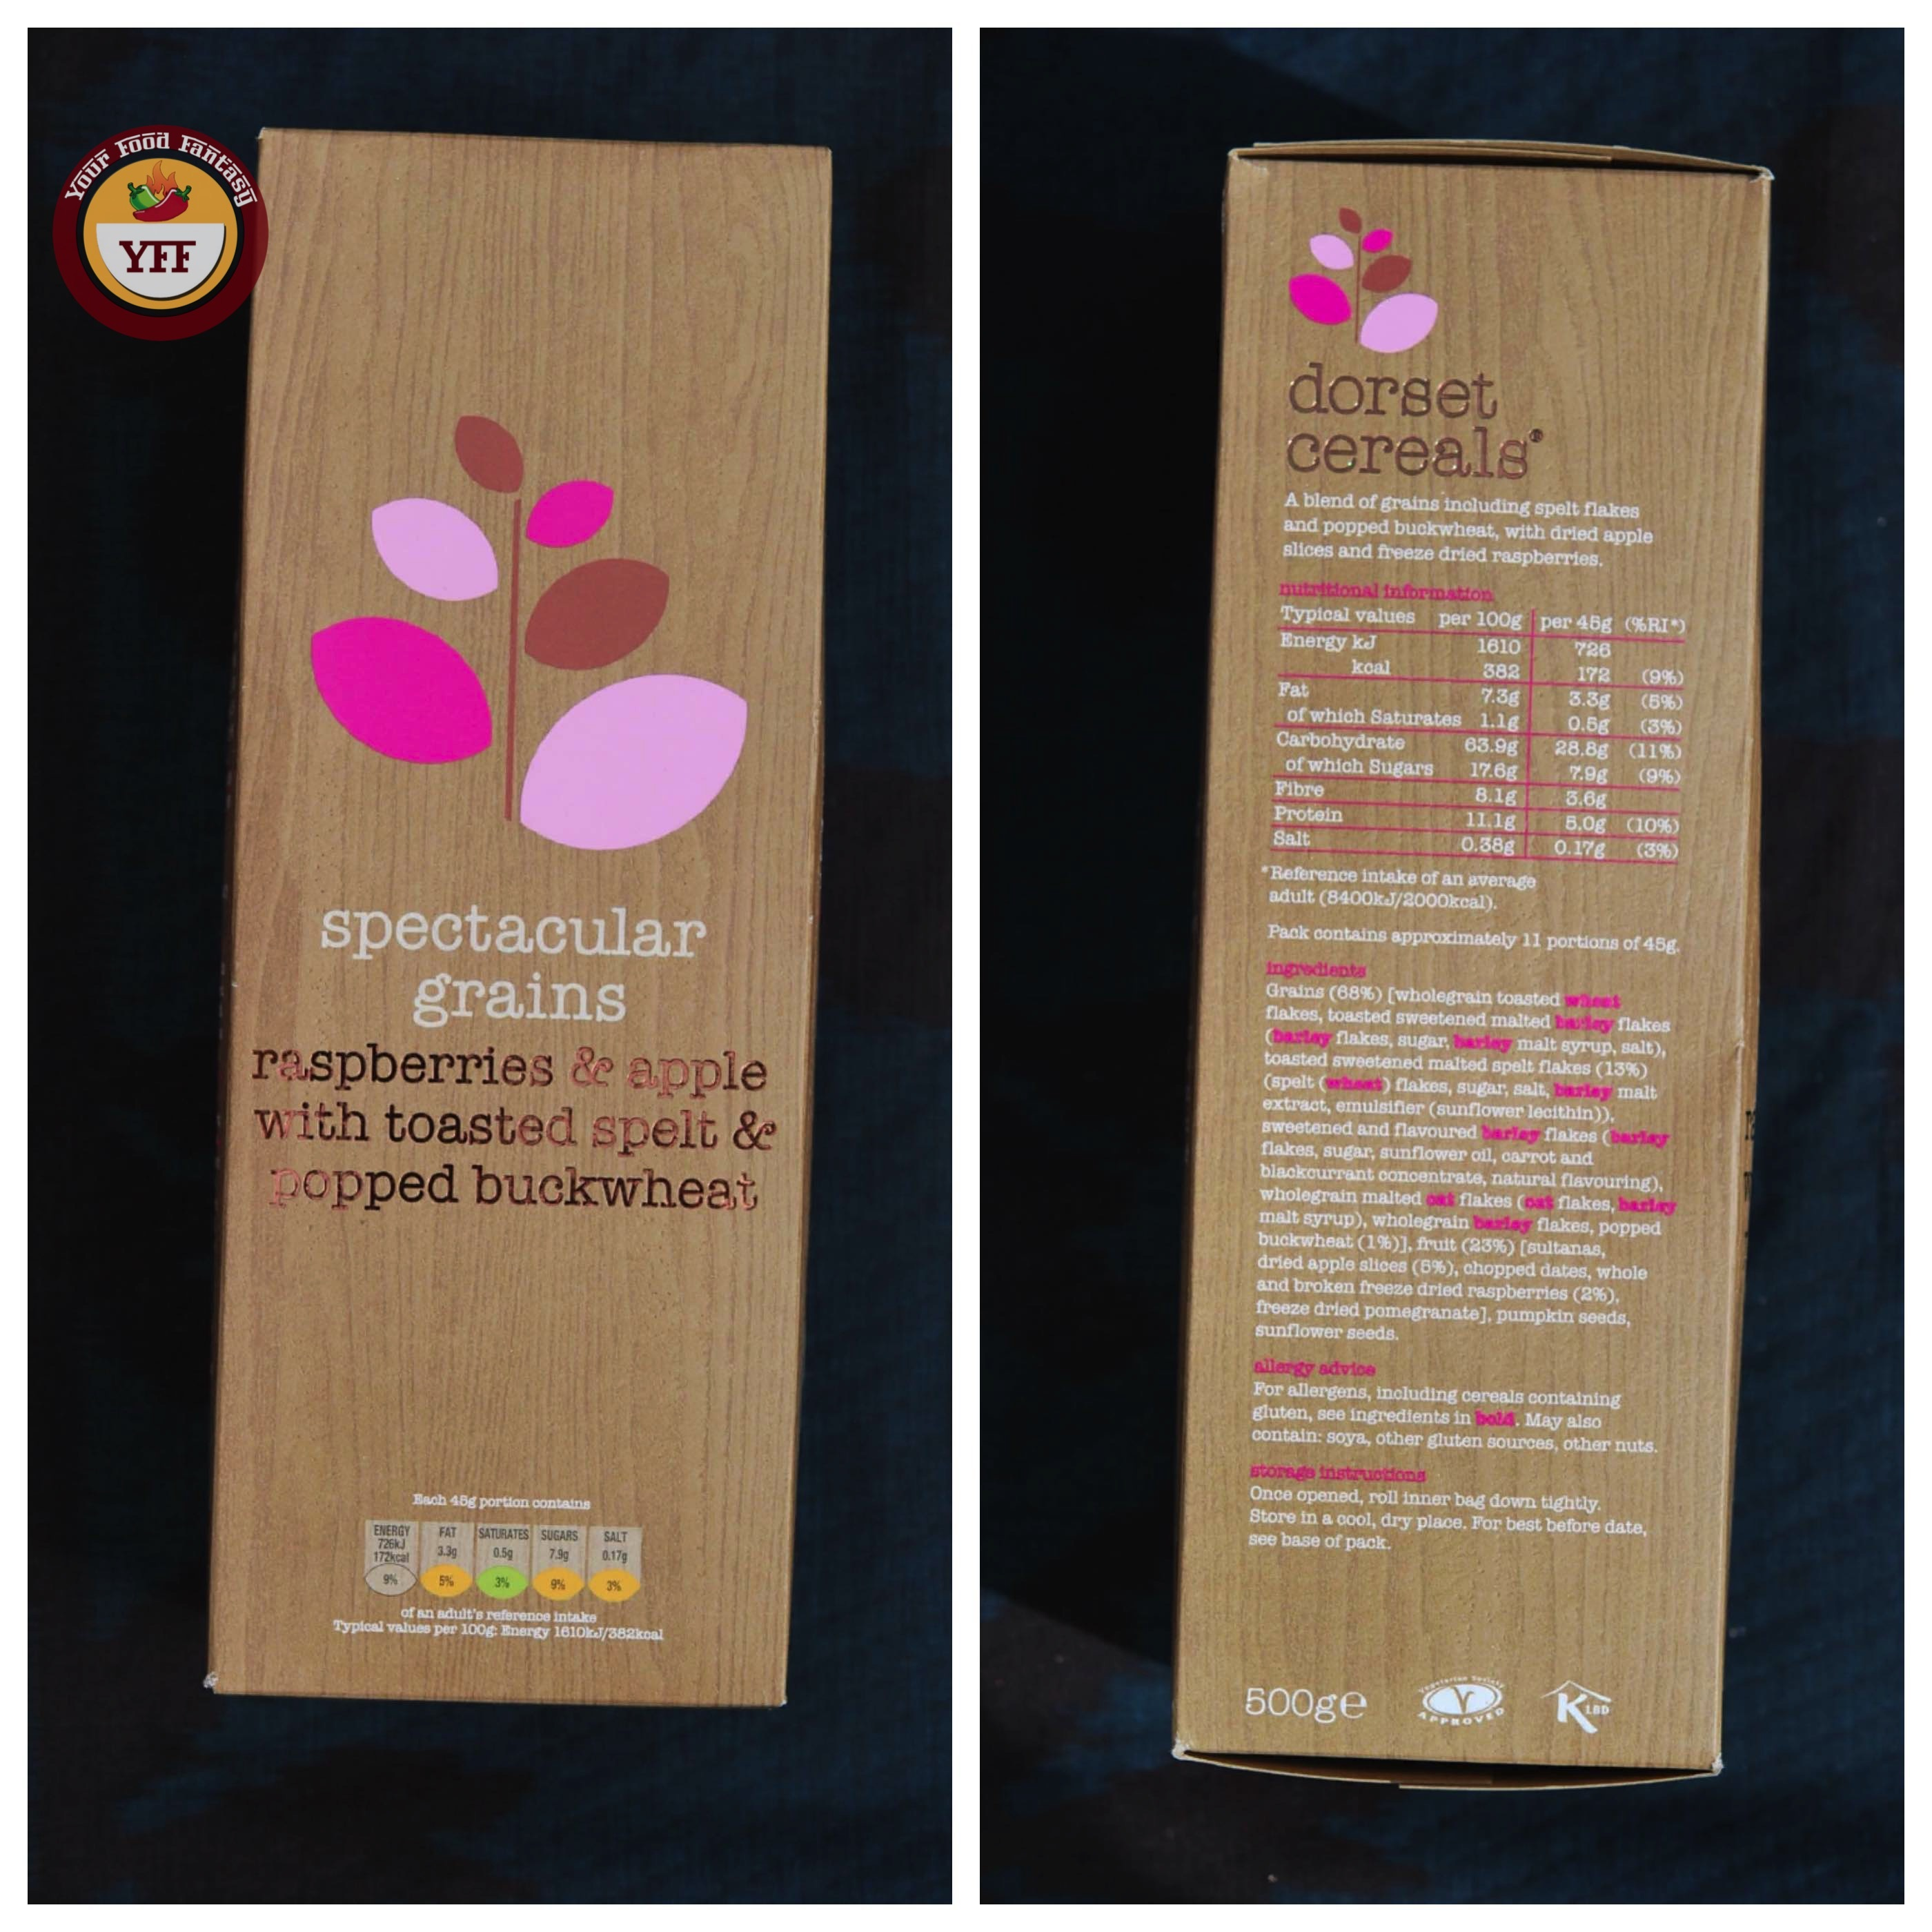 DegustaBox August Review - Dorset Cereals